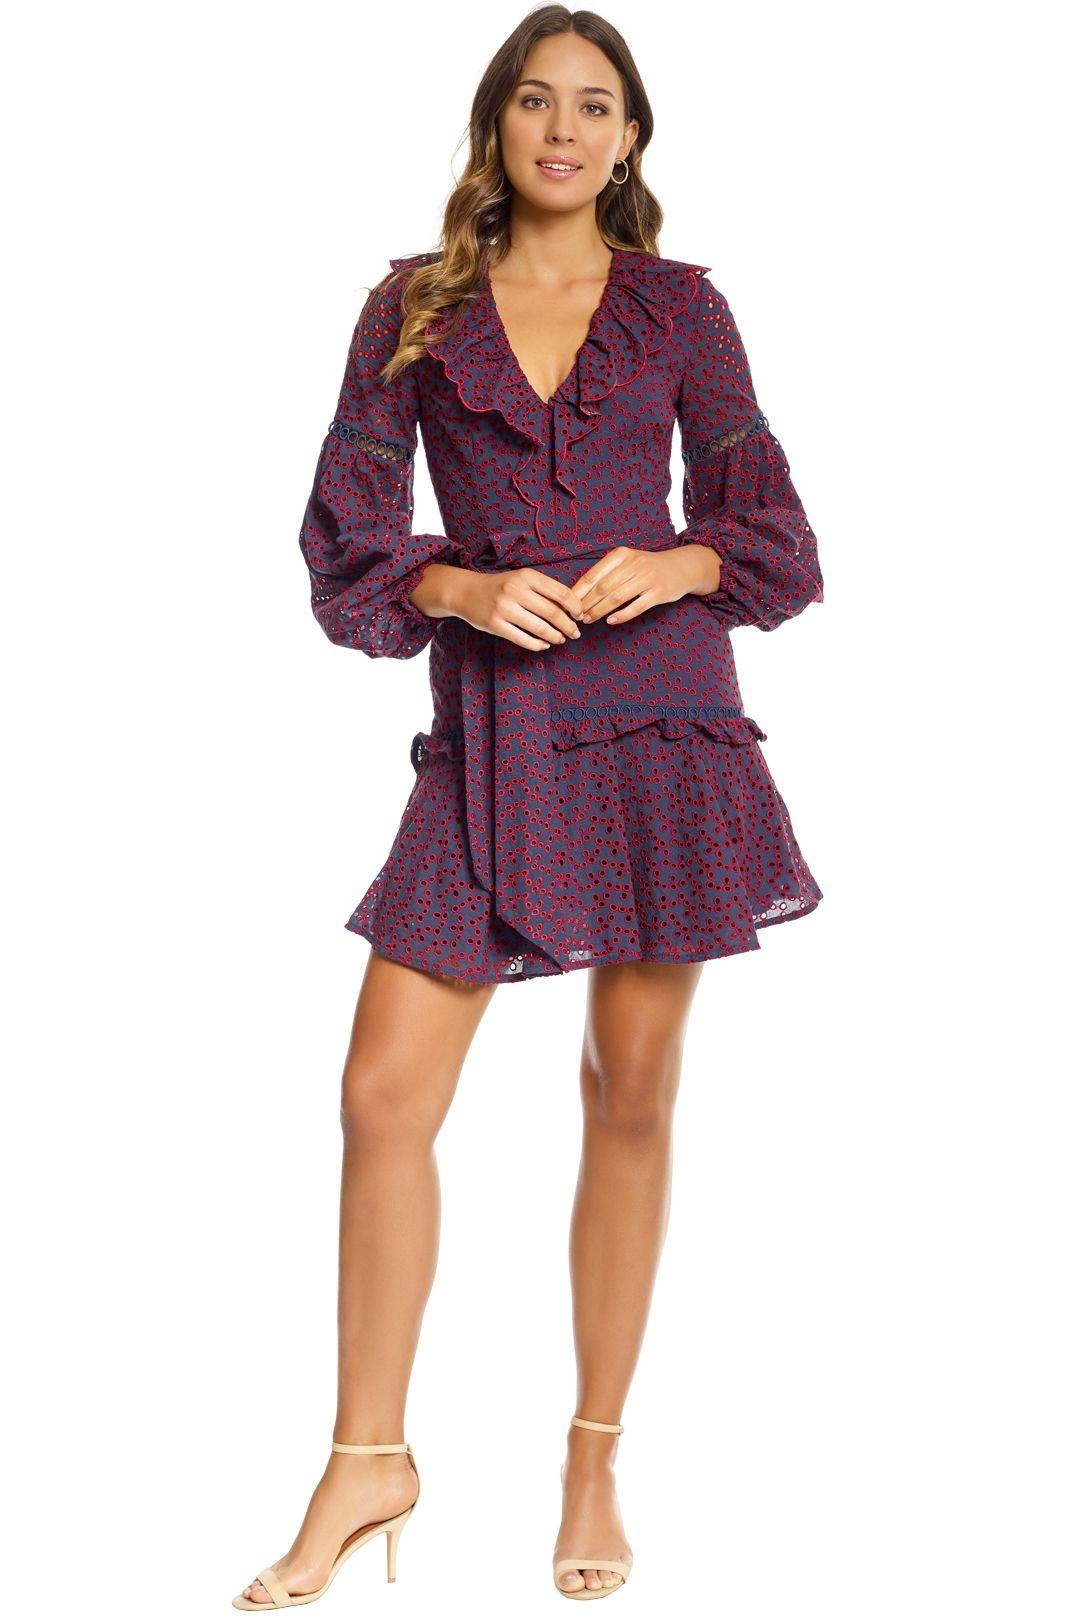 Keepsake The Label - Blossom LS Mini Dress - Burgundy Red - Front